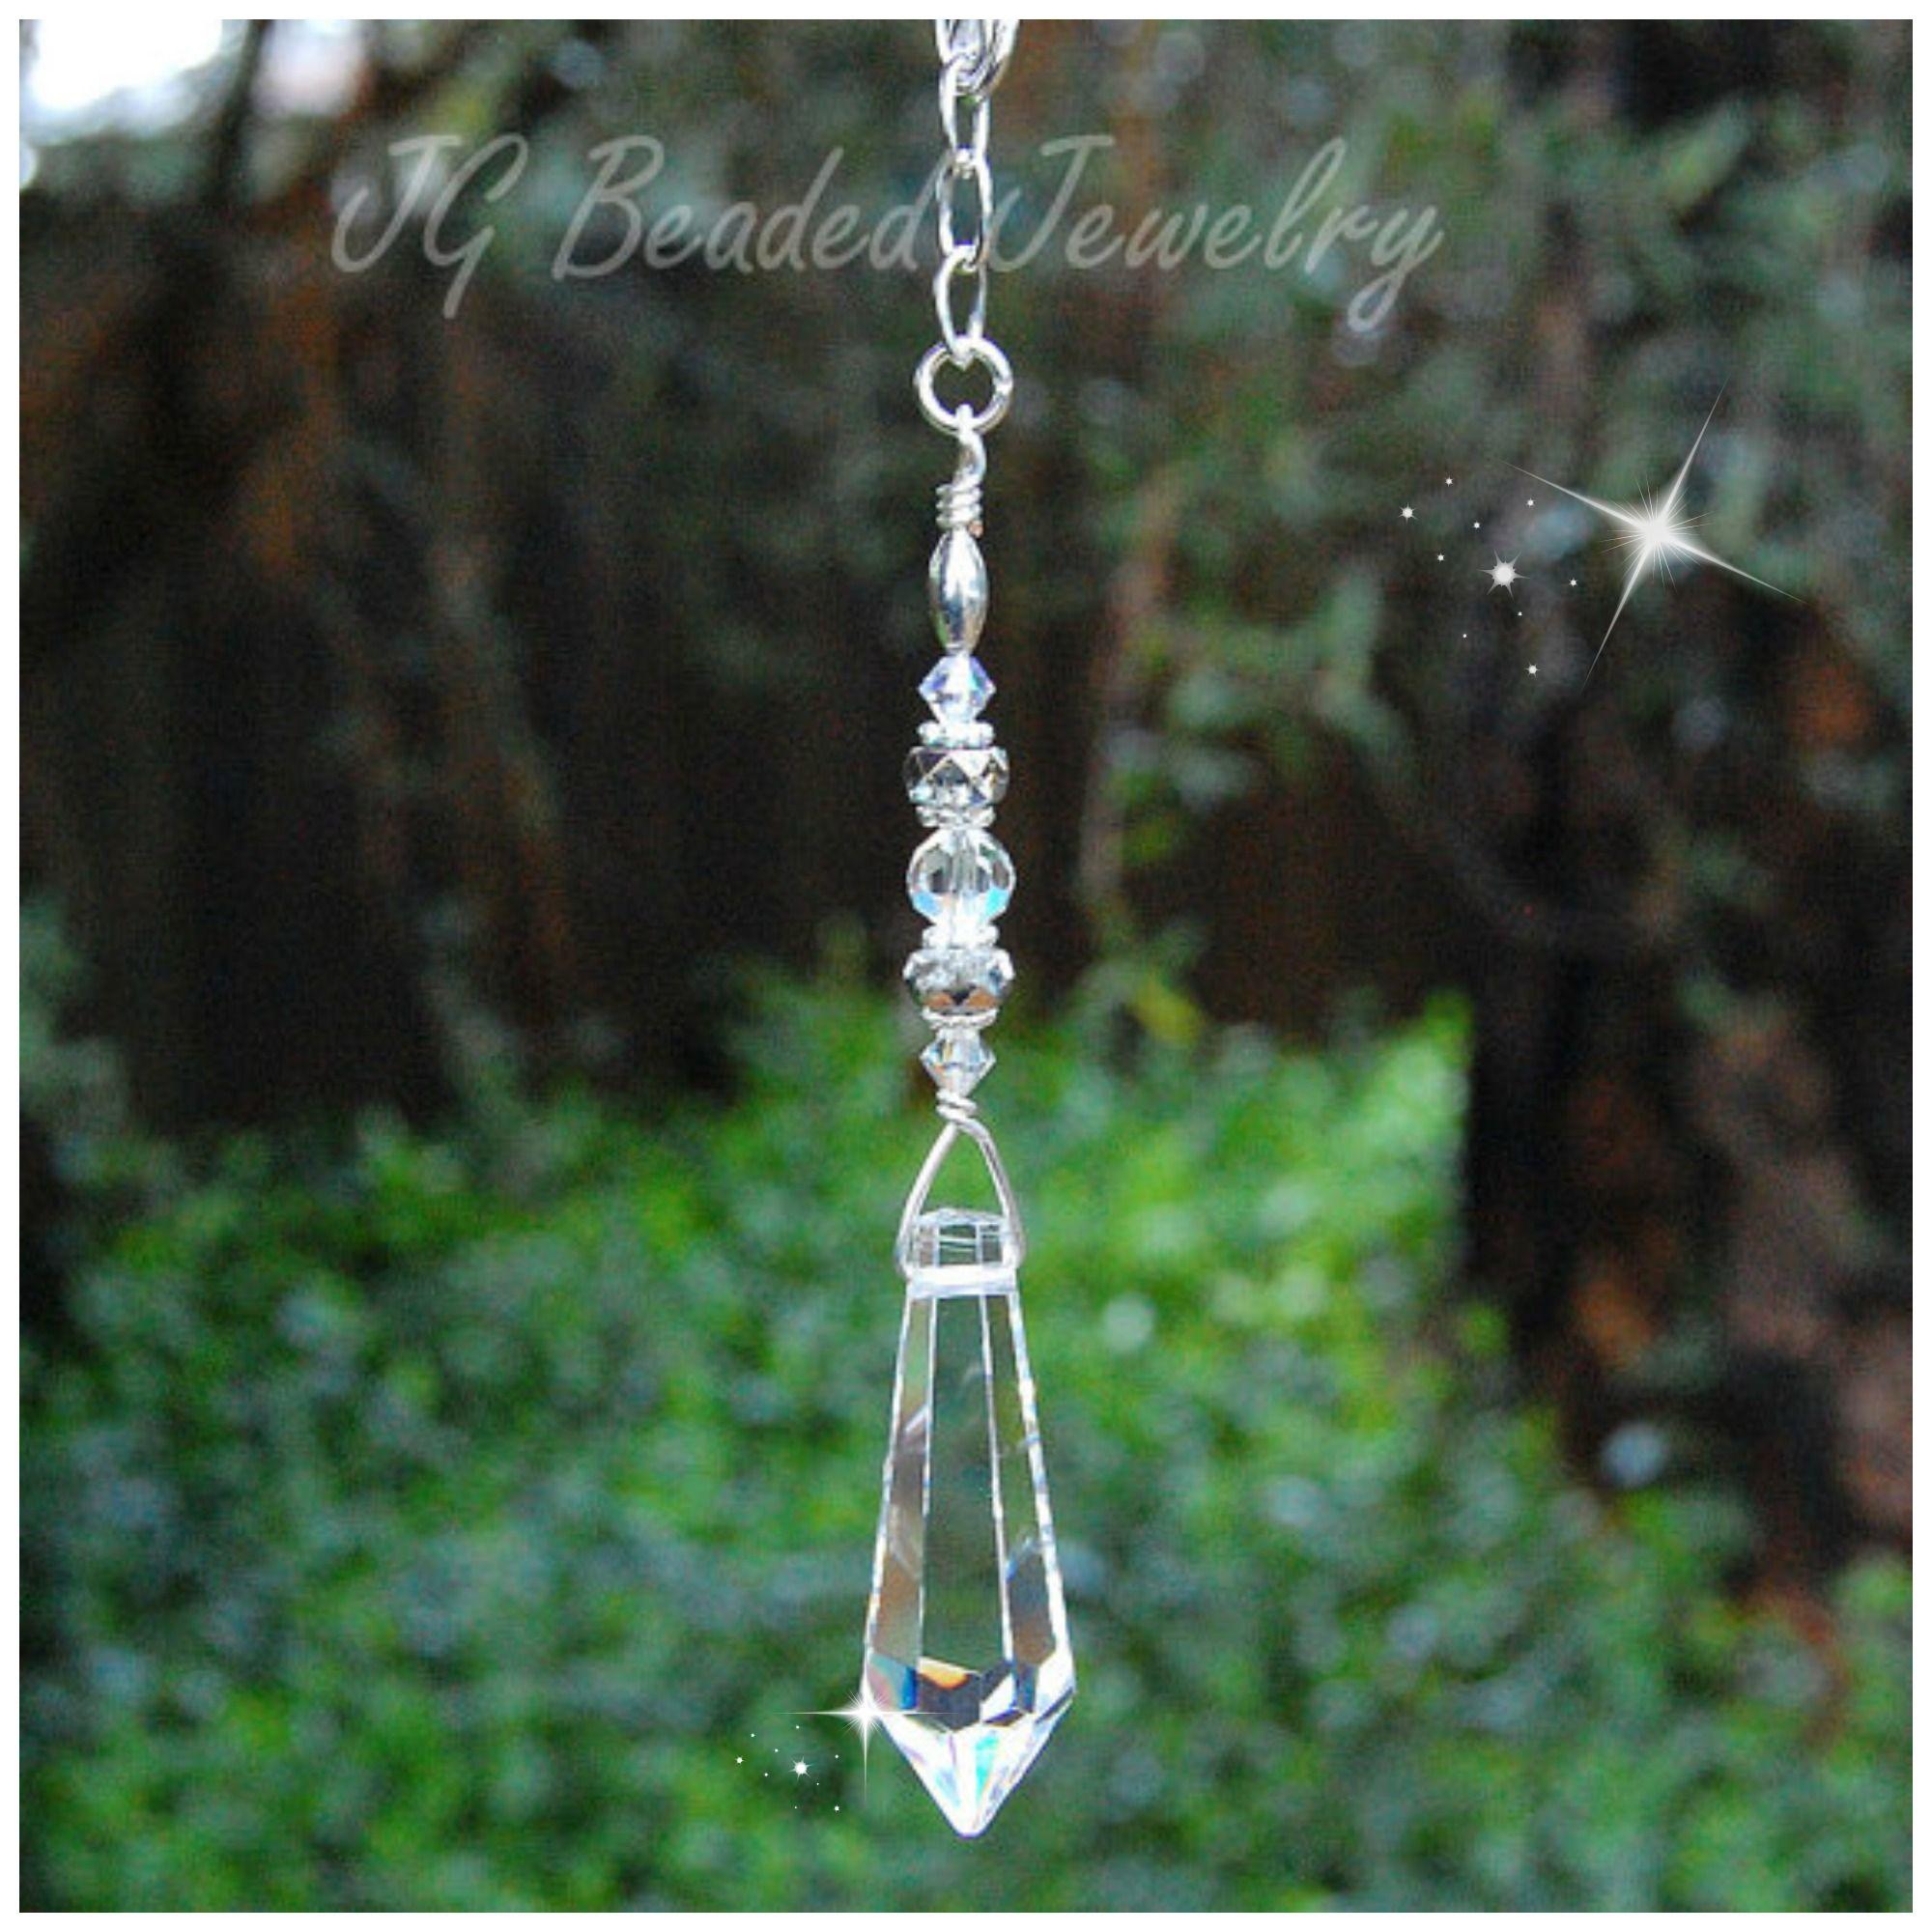 Teardrop Crystal Decoration Jgbeads Crystal Suncatchers Hanging Crystals Crystal Decor